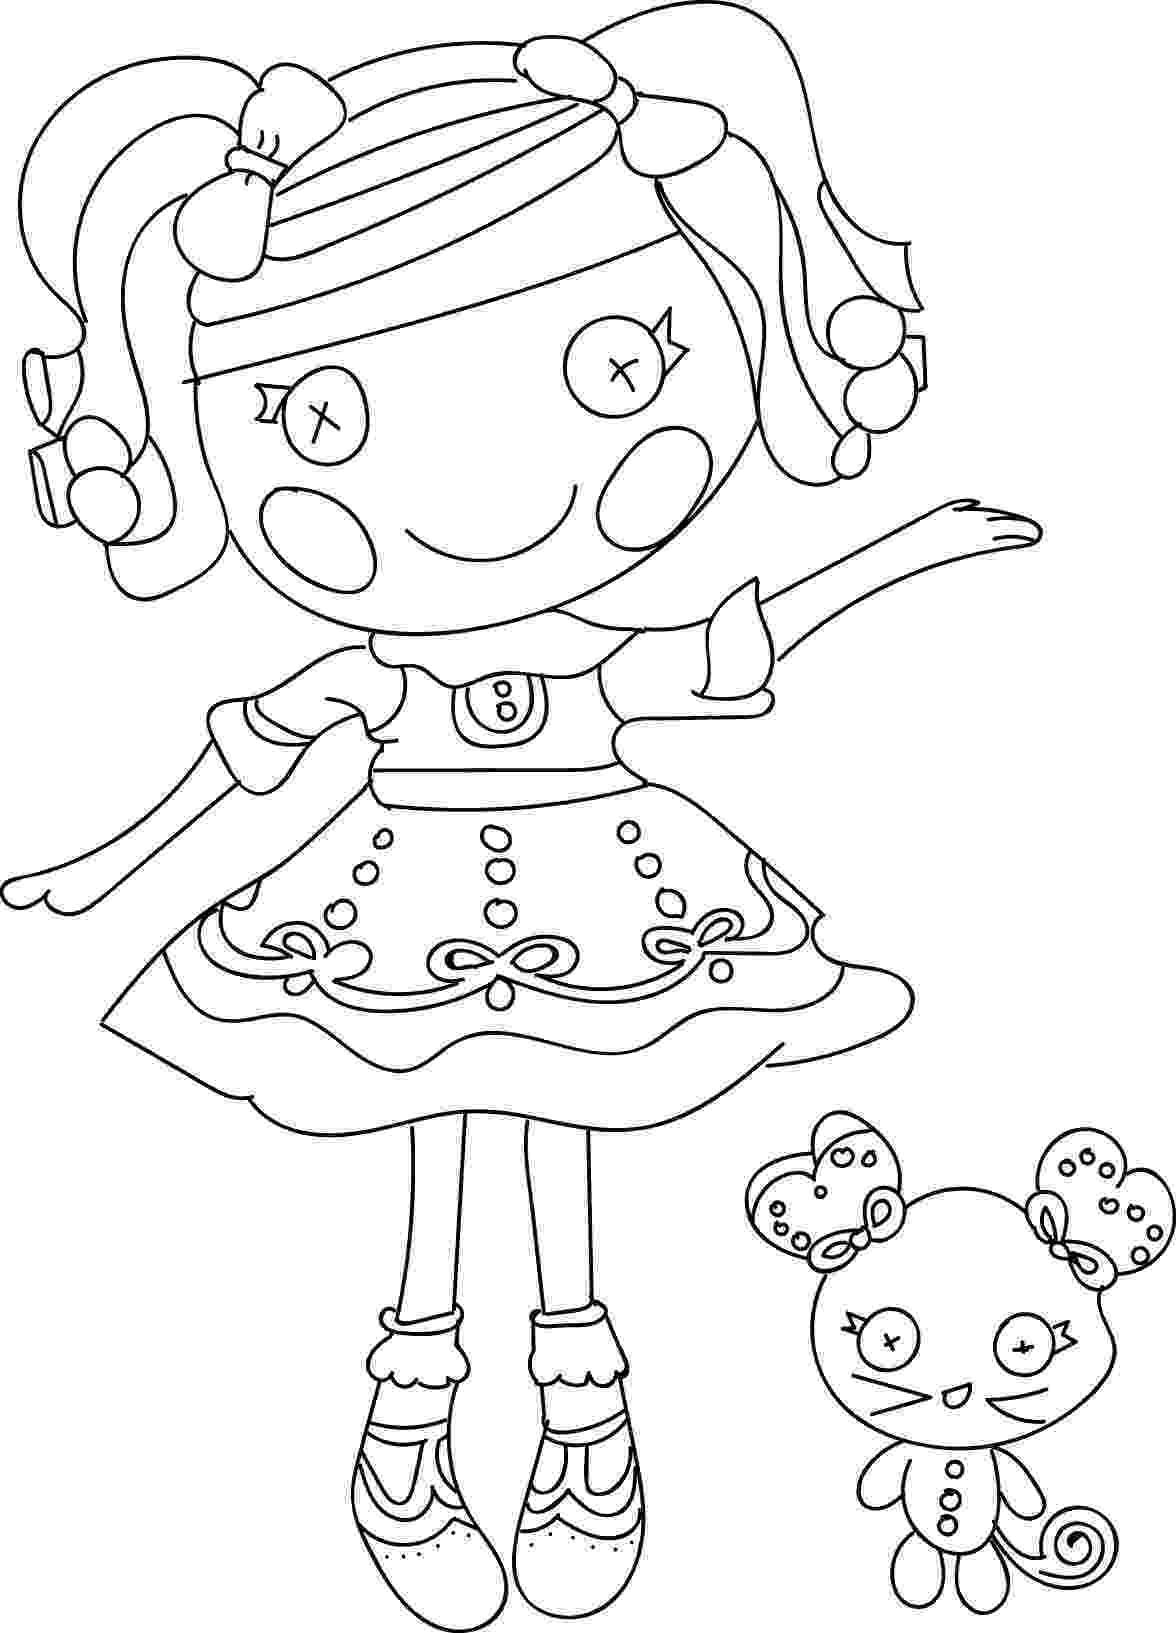 spongebob coloring sheets pdf spongebob coloring pages pdf at getcoloringscom free coloring pdf spongebob sheets